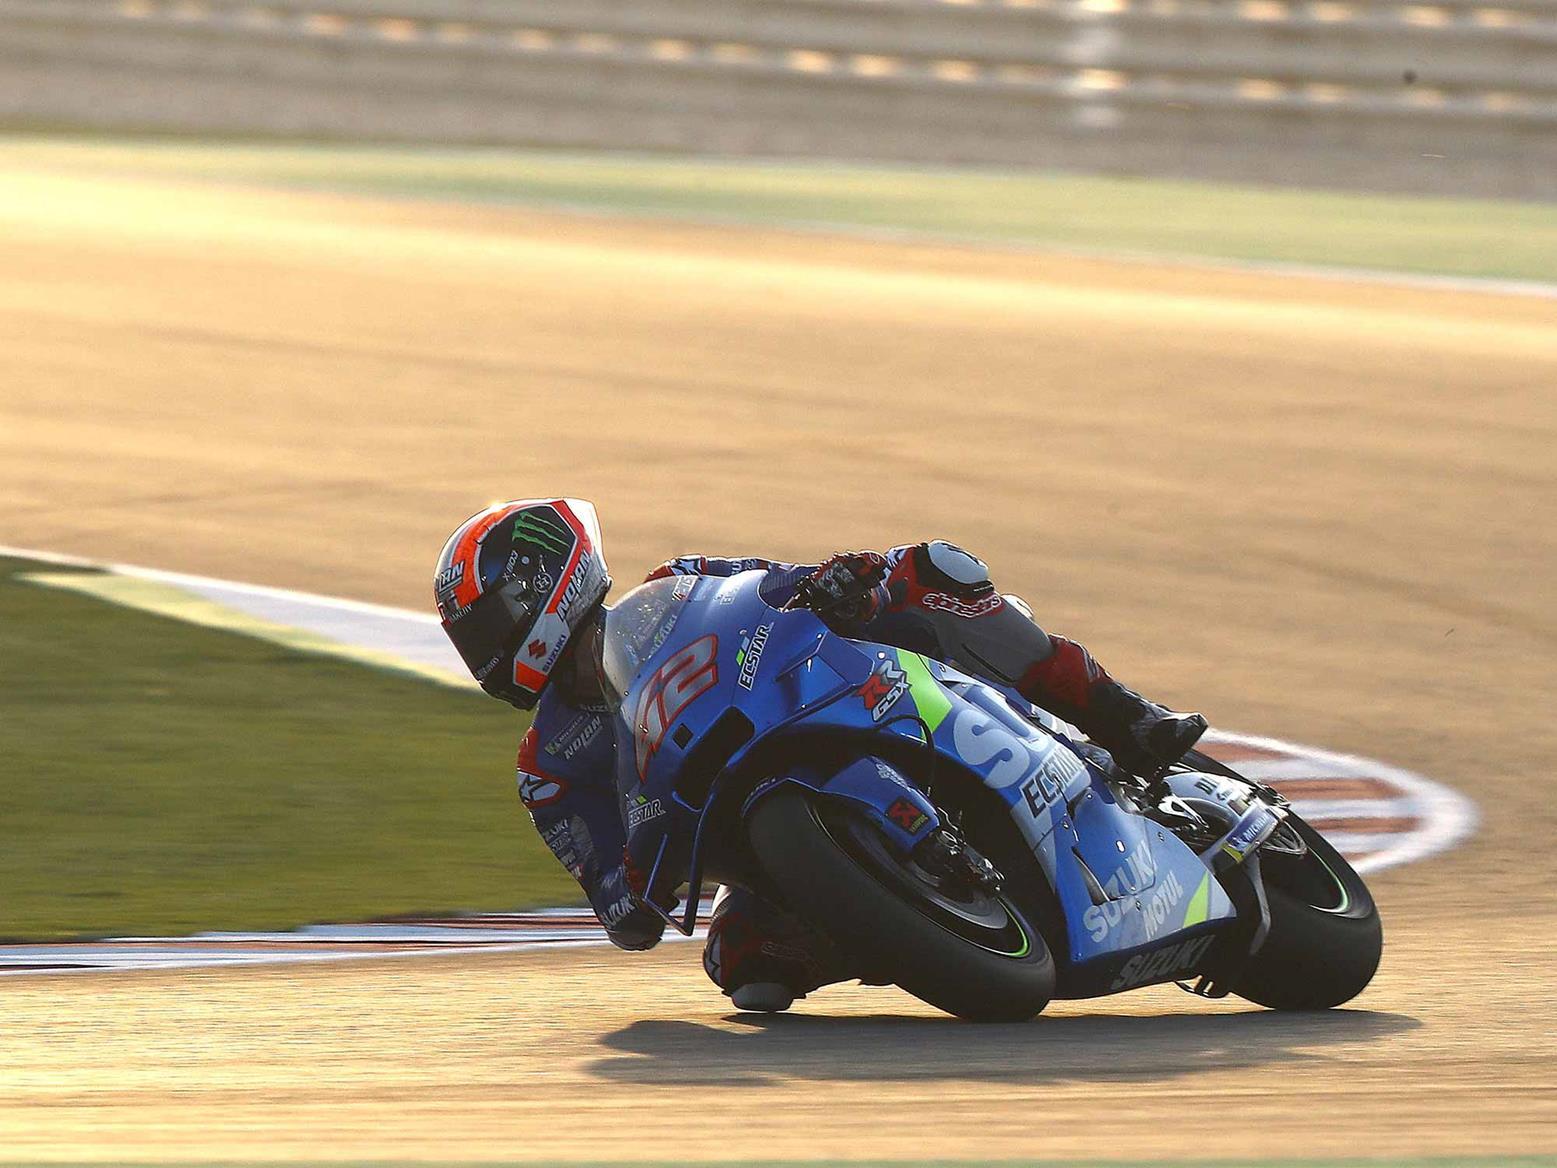 MotoGP: Suzuki in control after day one of the Qatar test